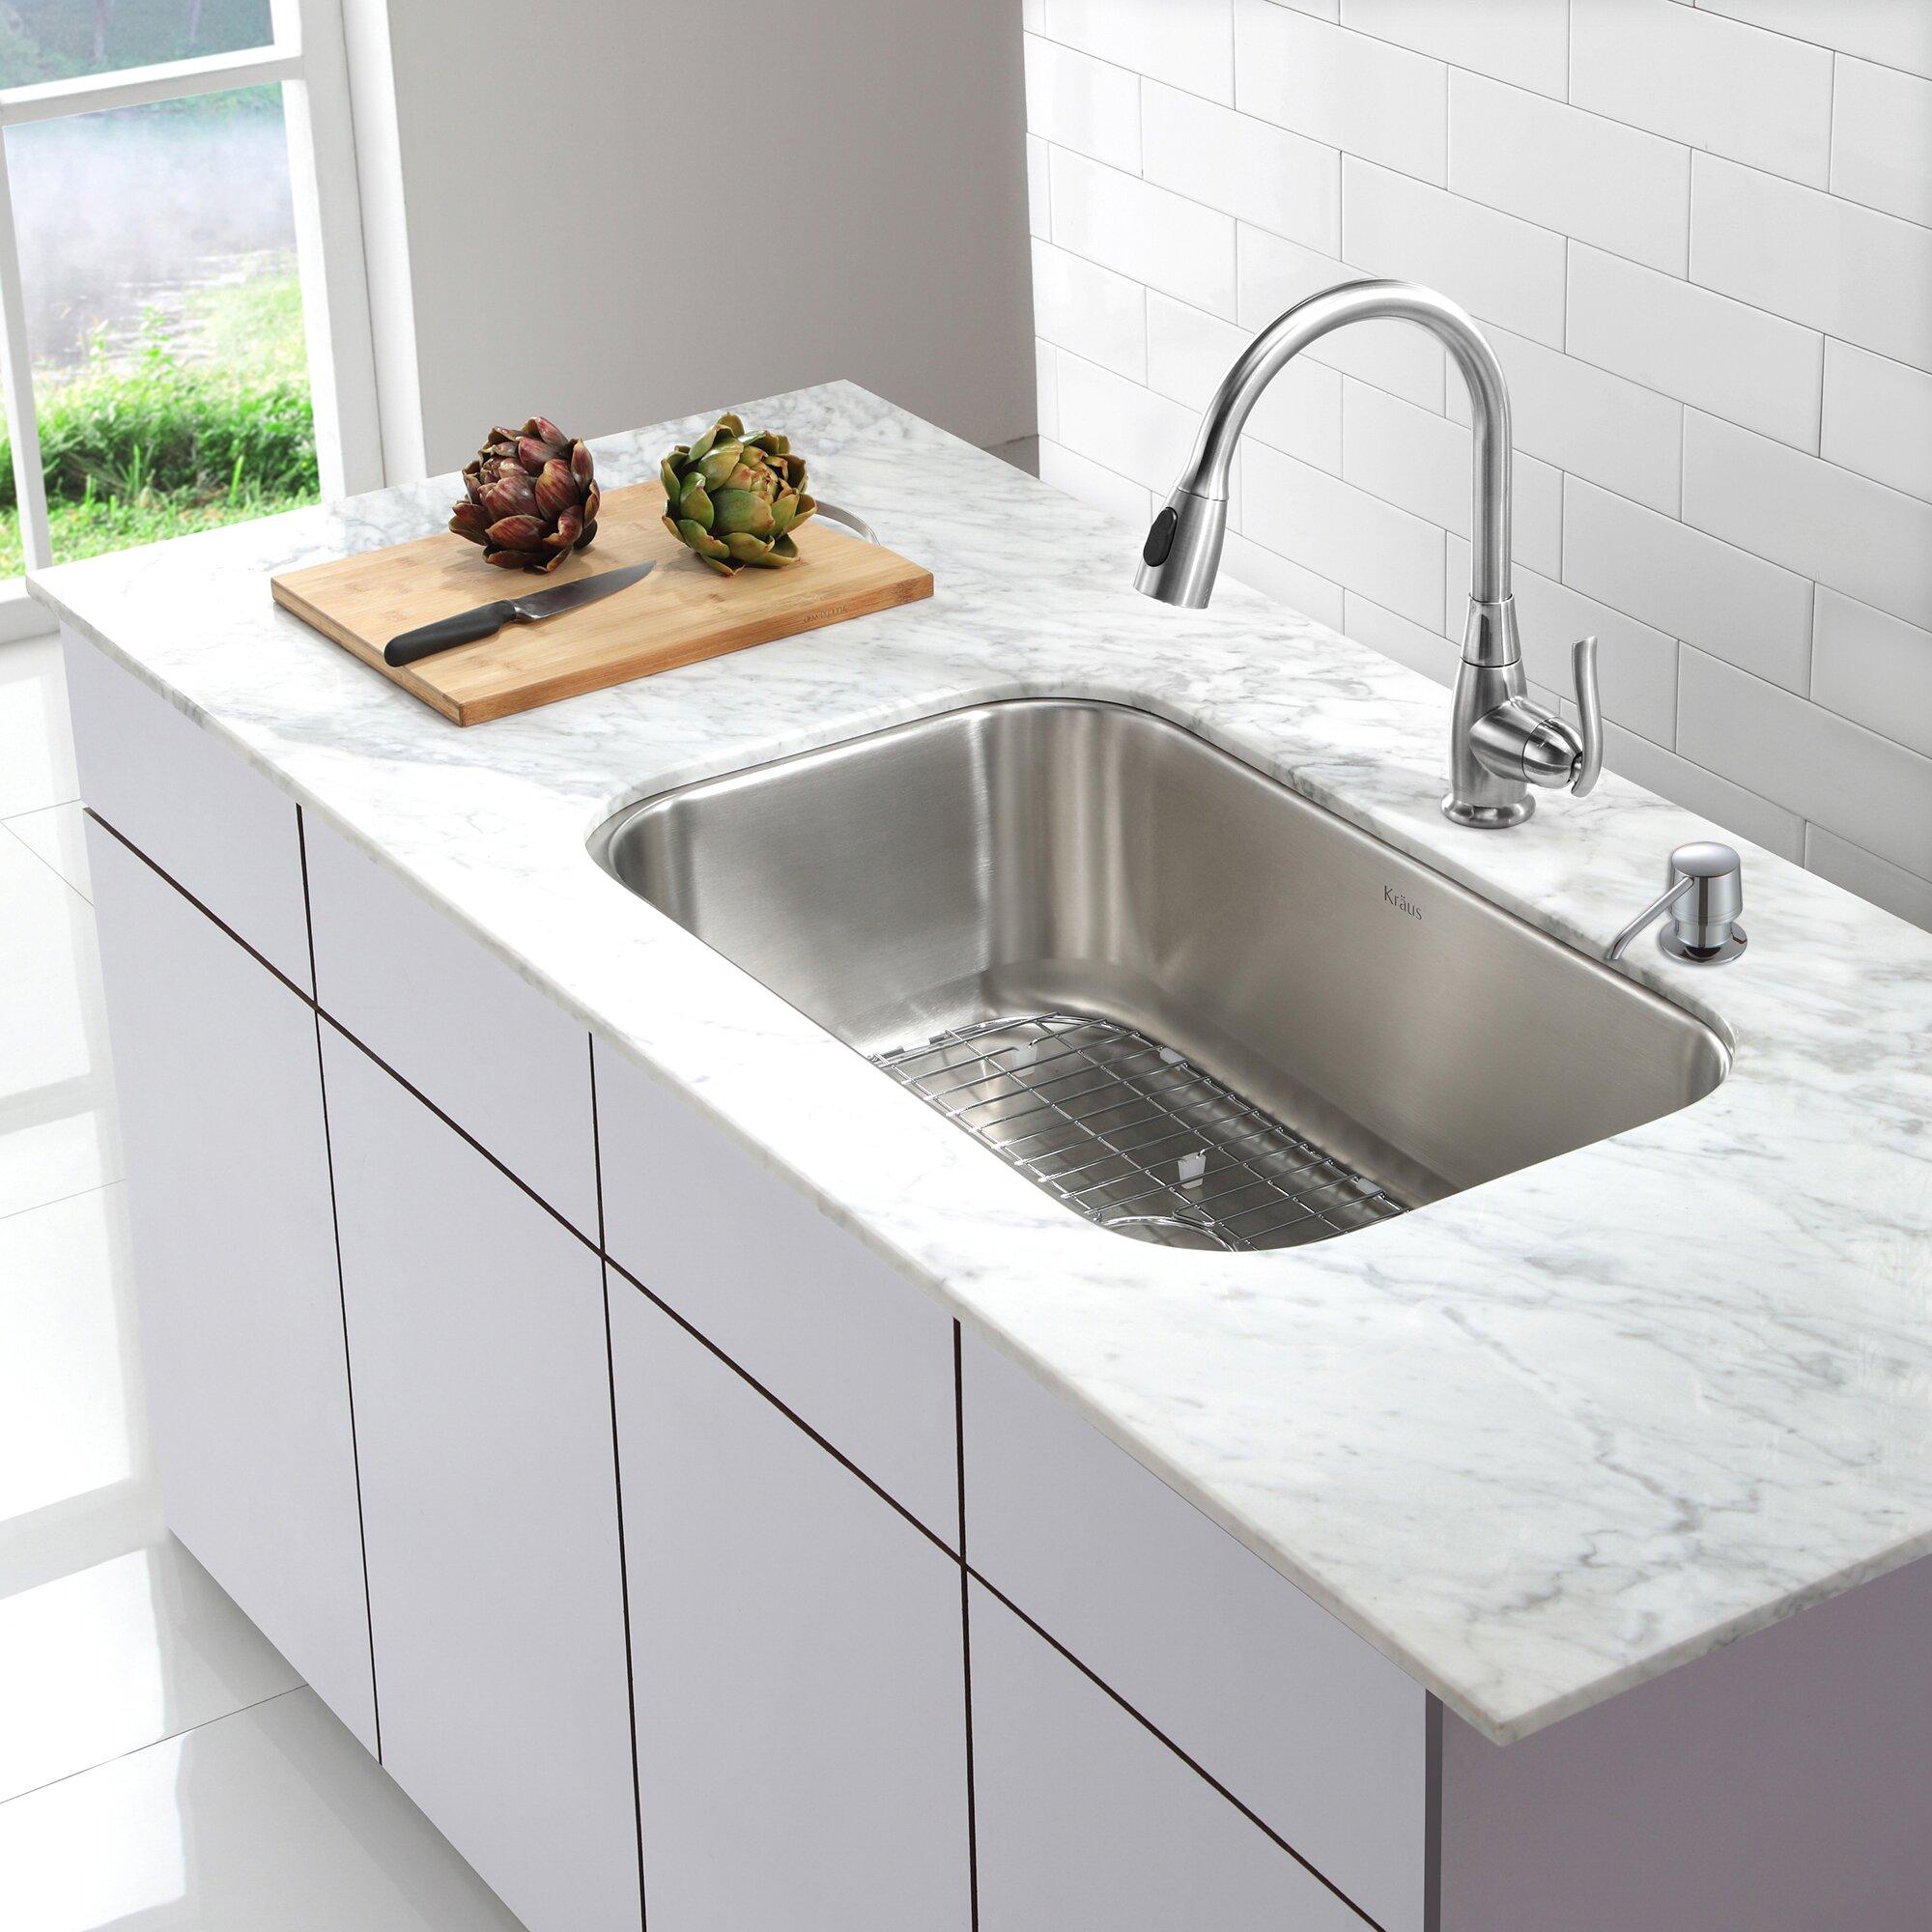 kraus one handle single hole kitchen faucet amp reviews kraus oletto single handle kitchen faucet amp reviews